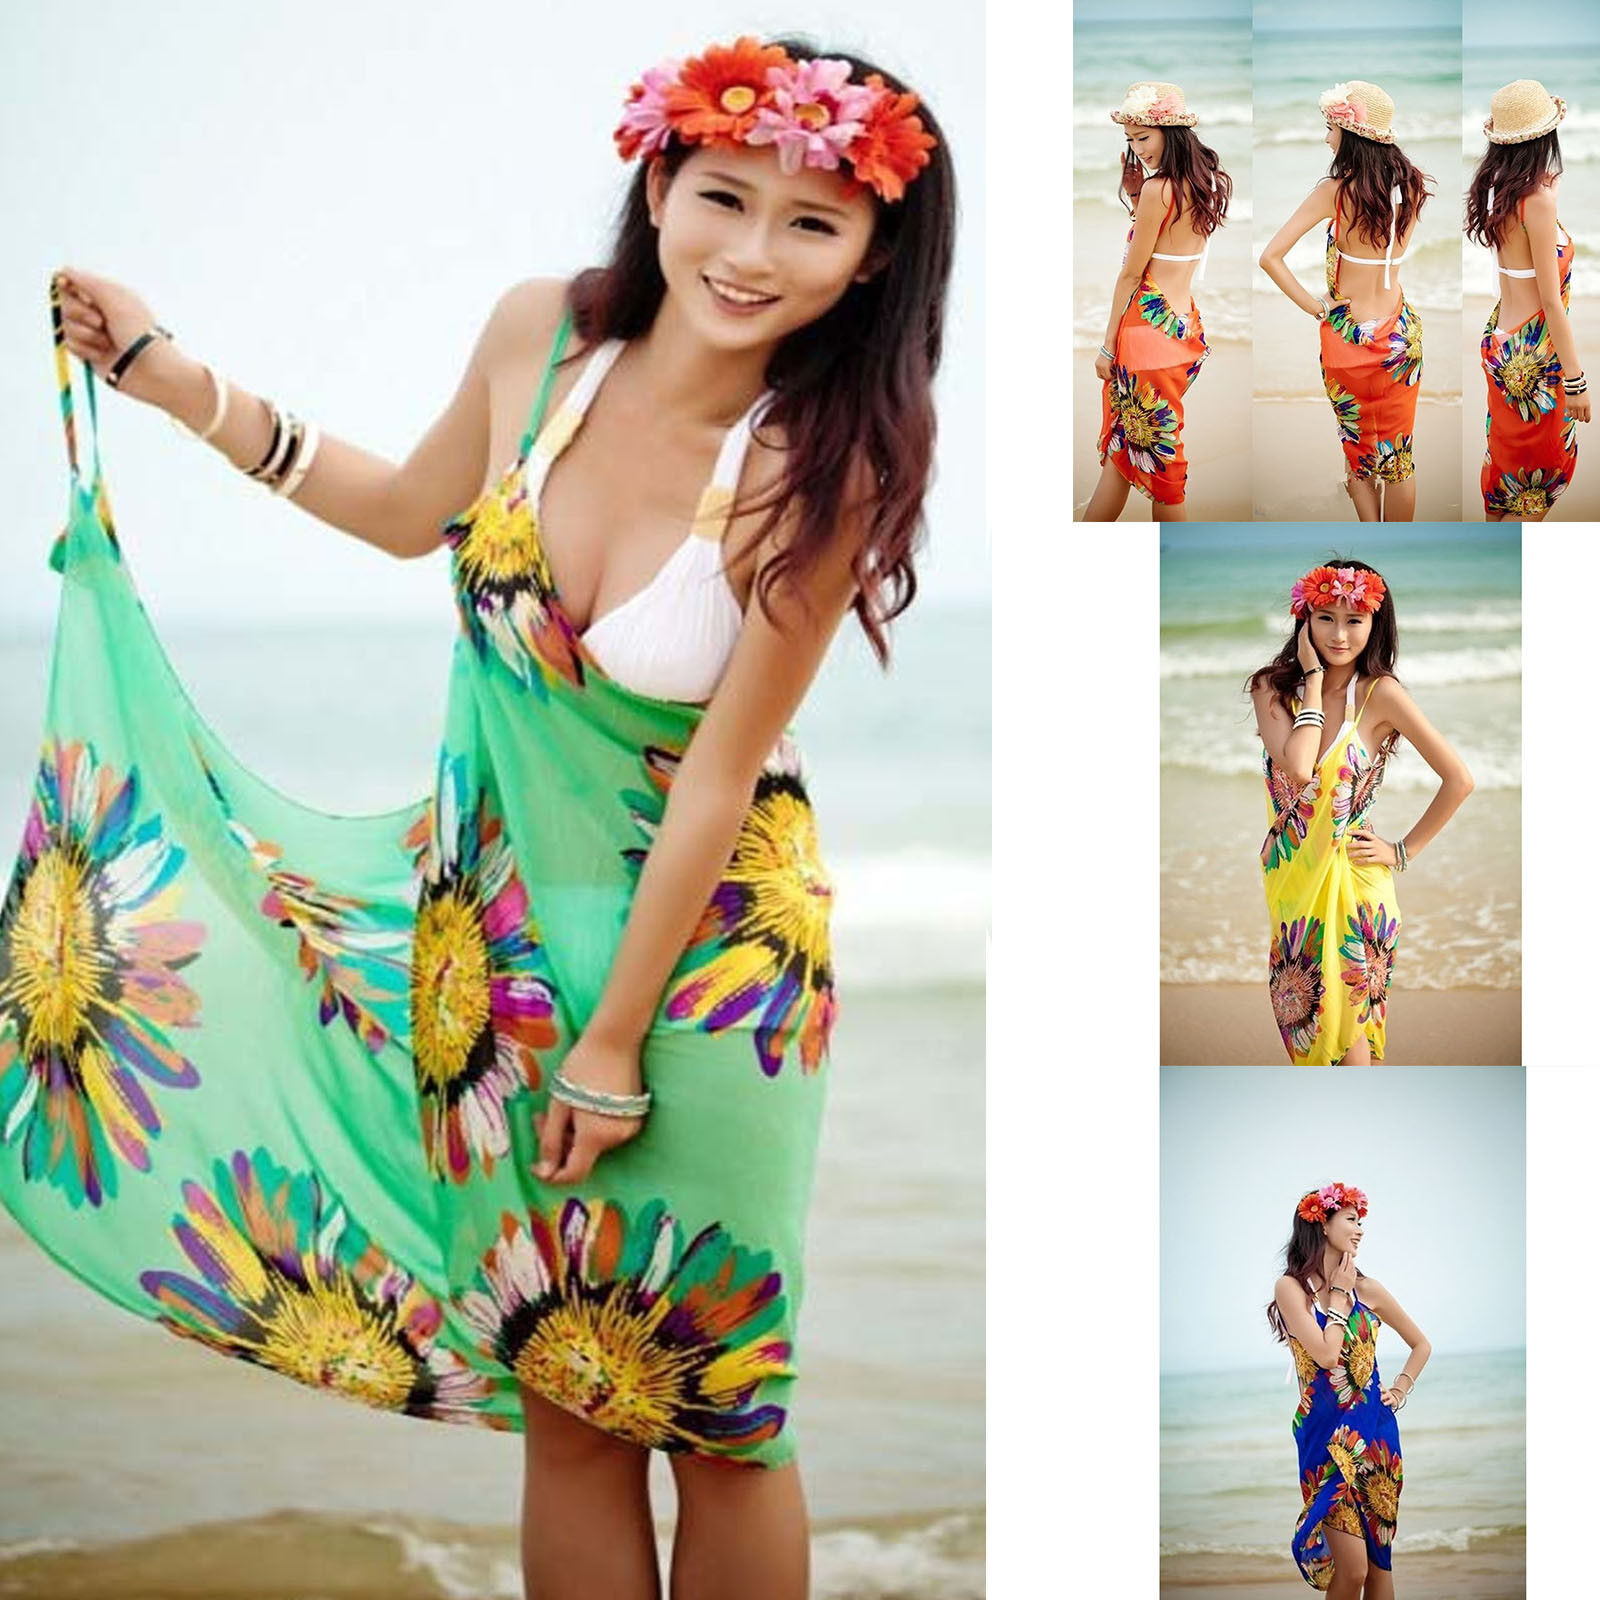 Blouses & Shirts Fashion Women Summer Bathing Suit Bikini Swimwear Cover Up Beach Shirts Sarong Wrap Pareo Excellent Quality